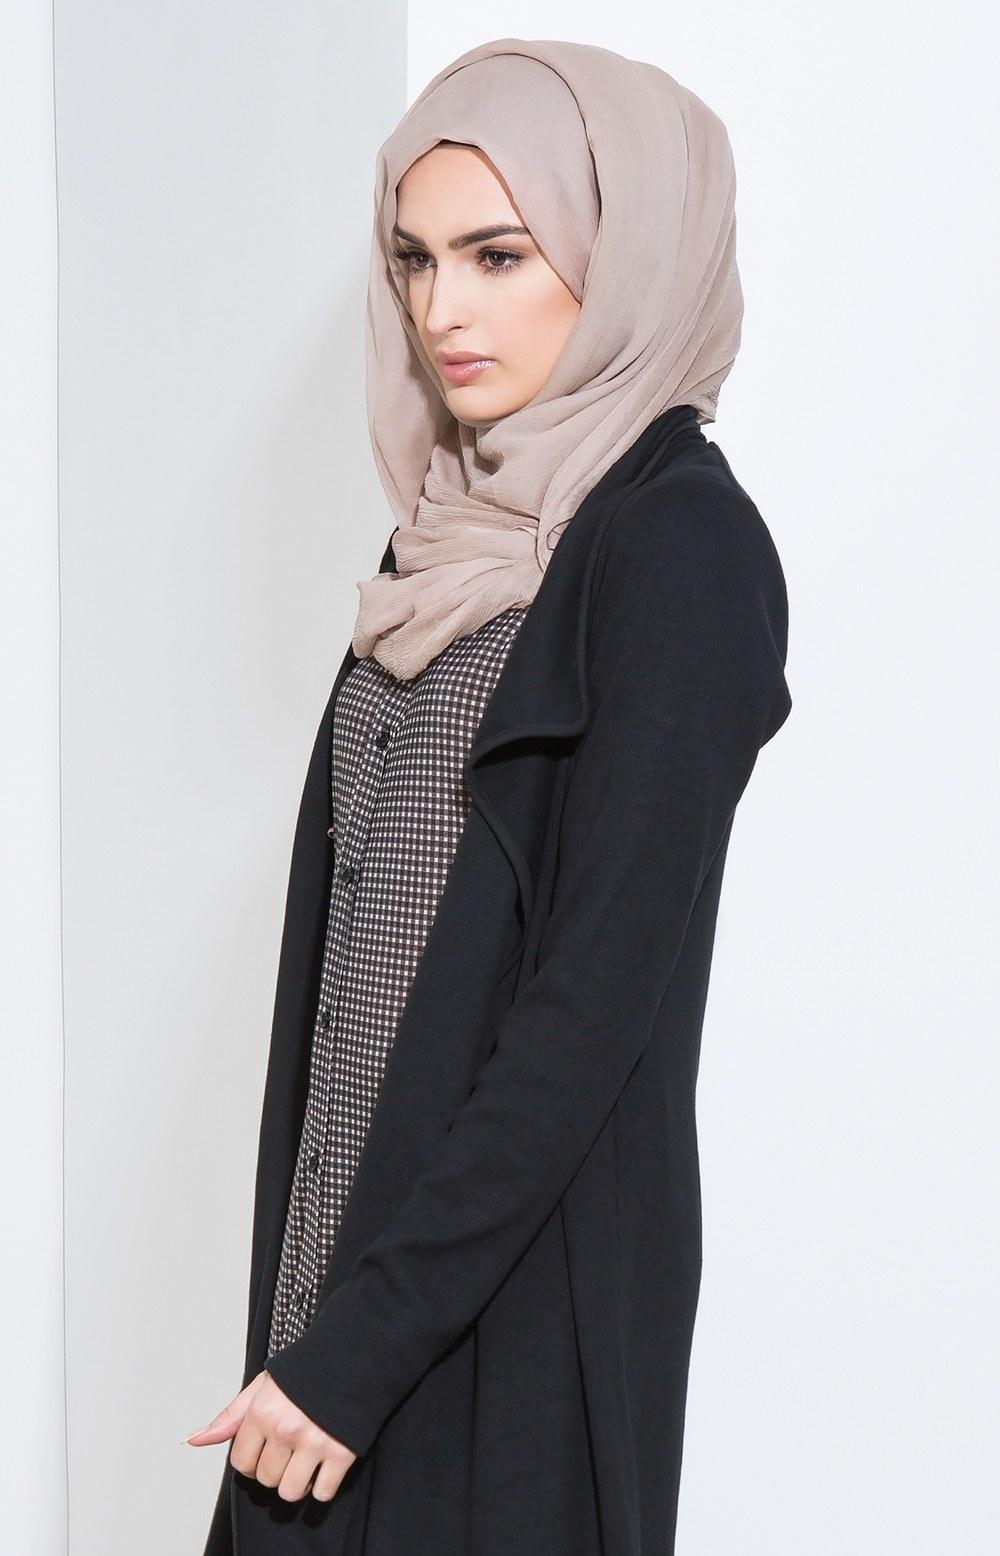 Inspirasi Model Baju Lebaran Tldn 25 Trend Model Baju Muslim Lebaran 2018 Simple & Modis